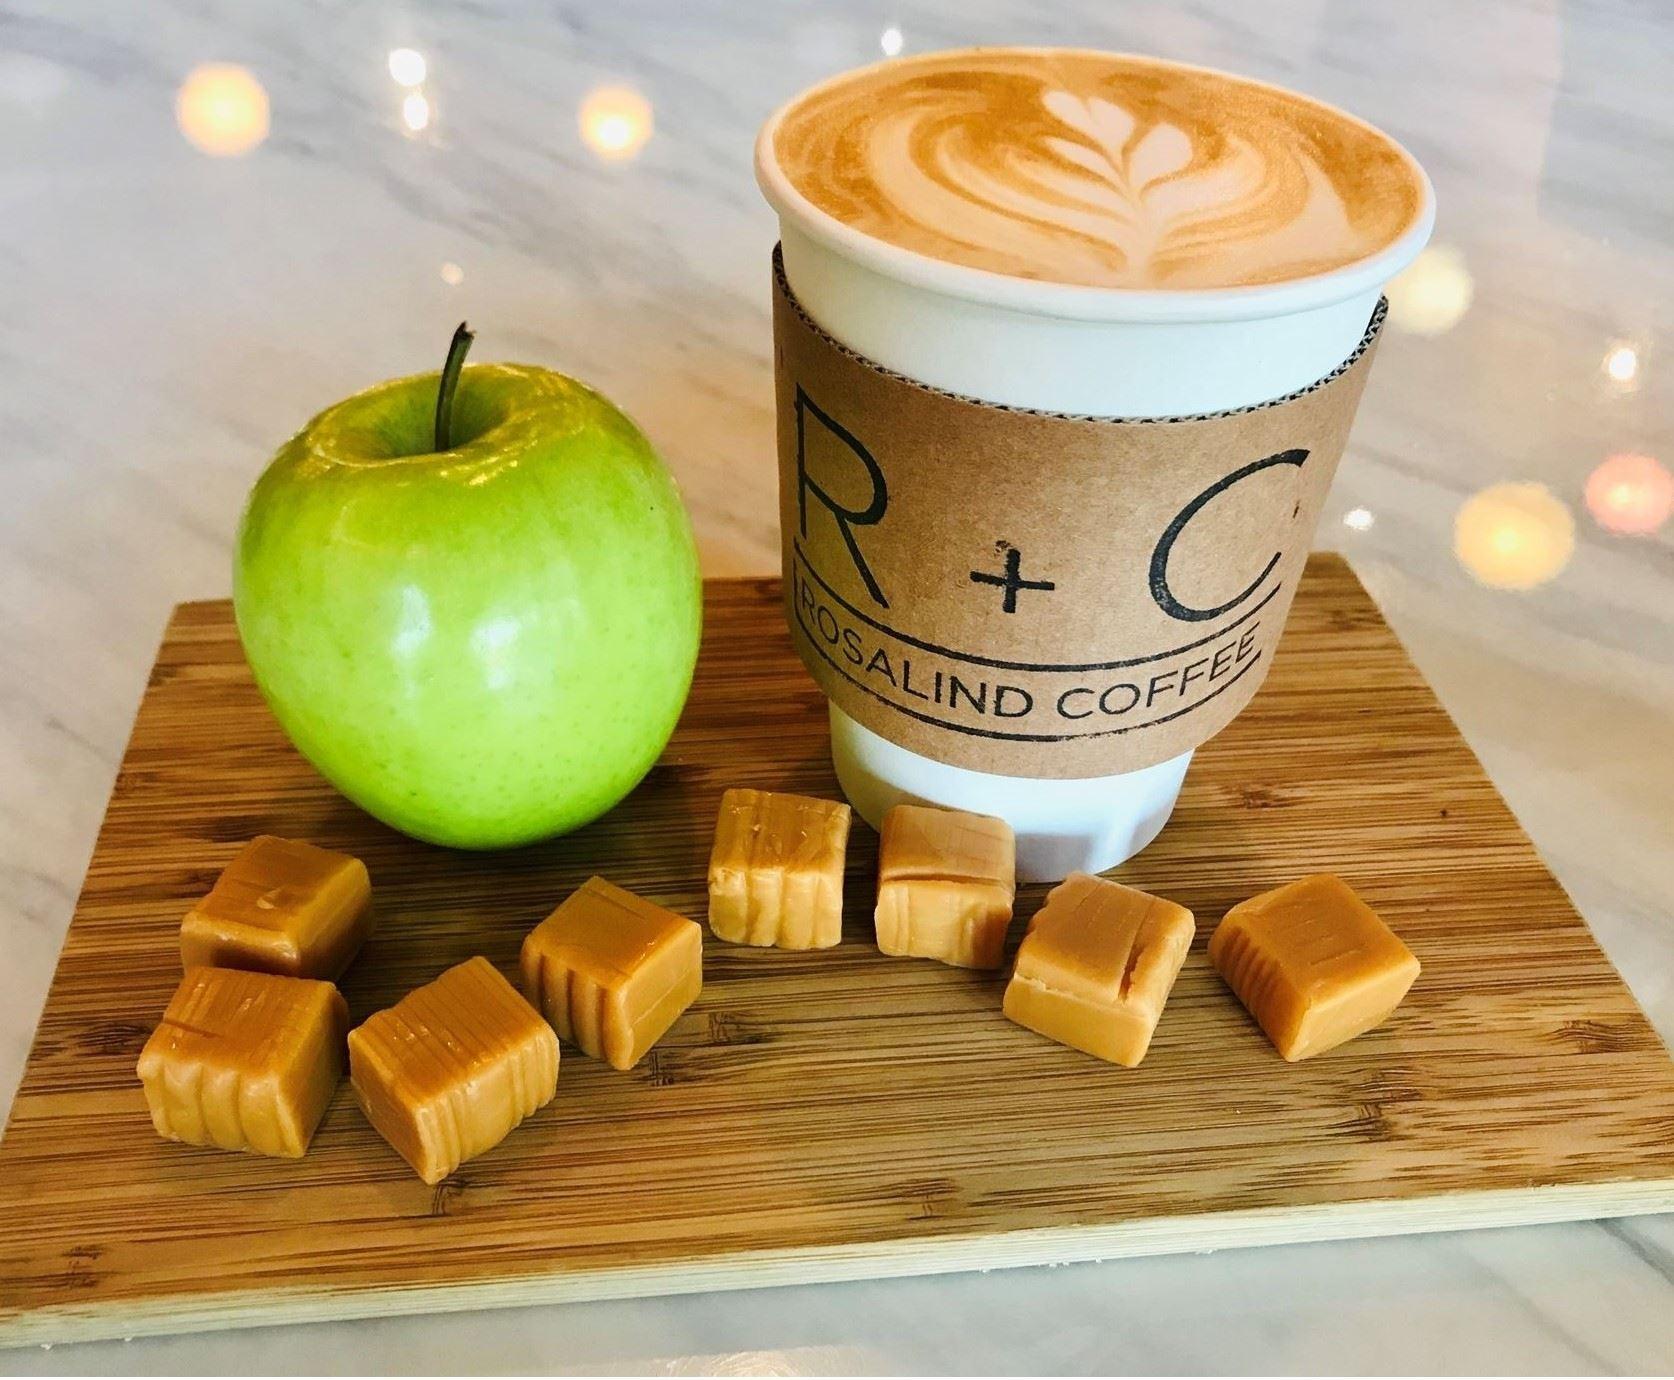 Rosalind Coffee